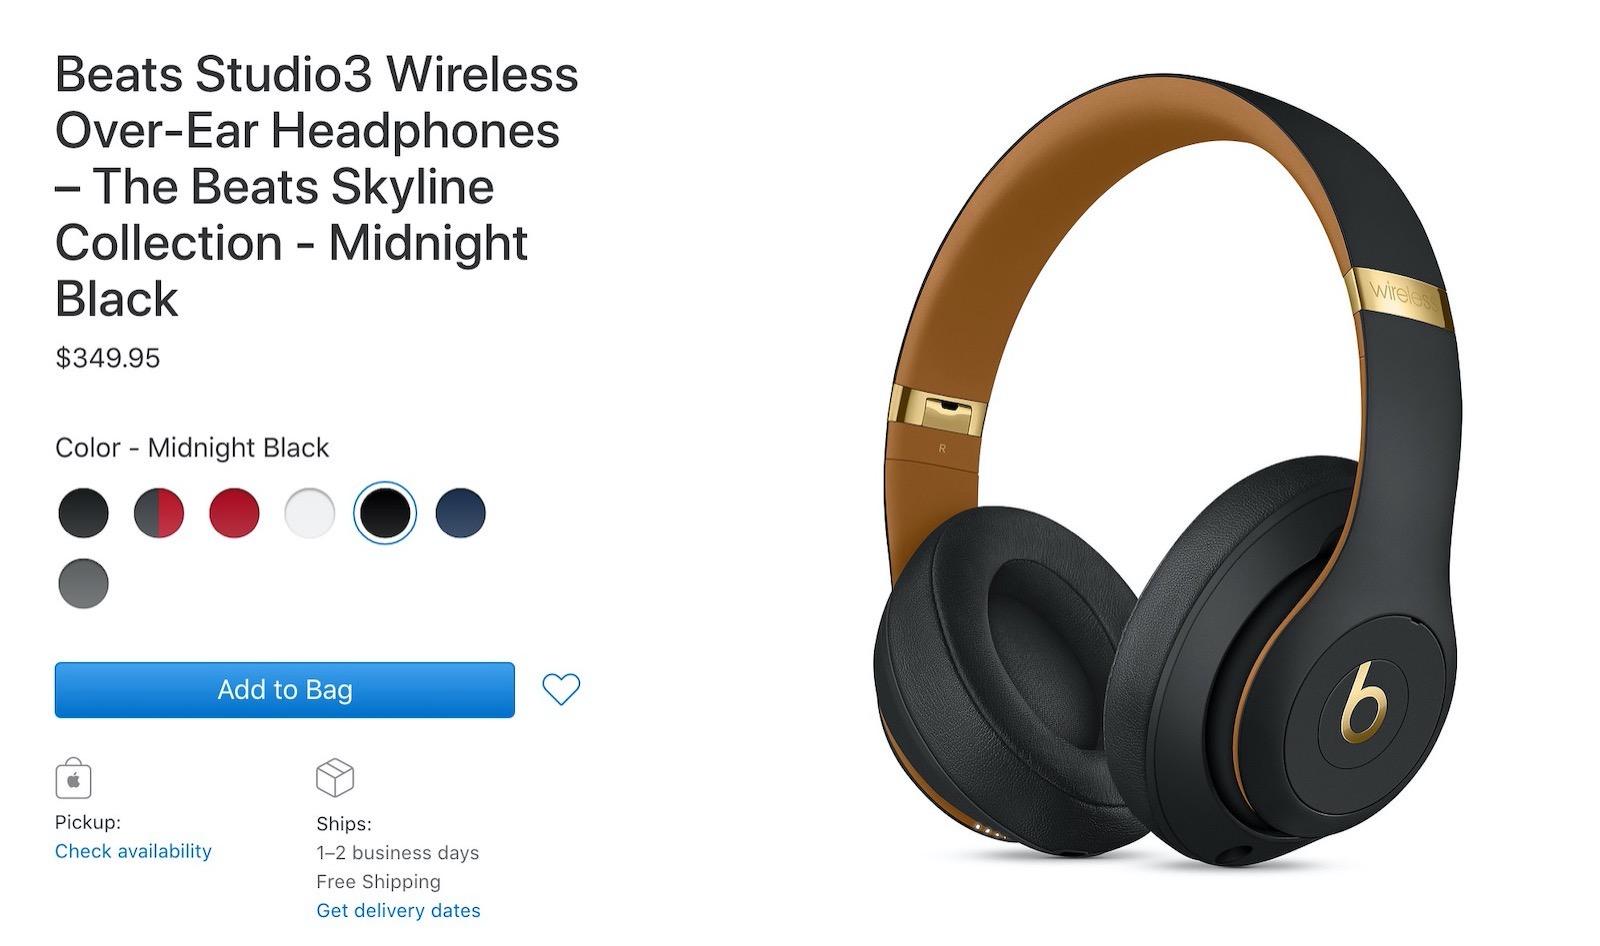 Beats studio3 wireless headphones the beats skyline collection midnight black